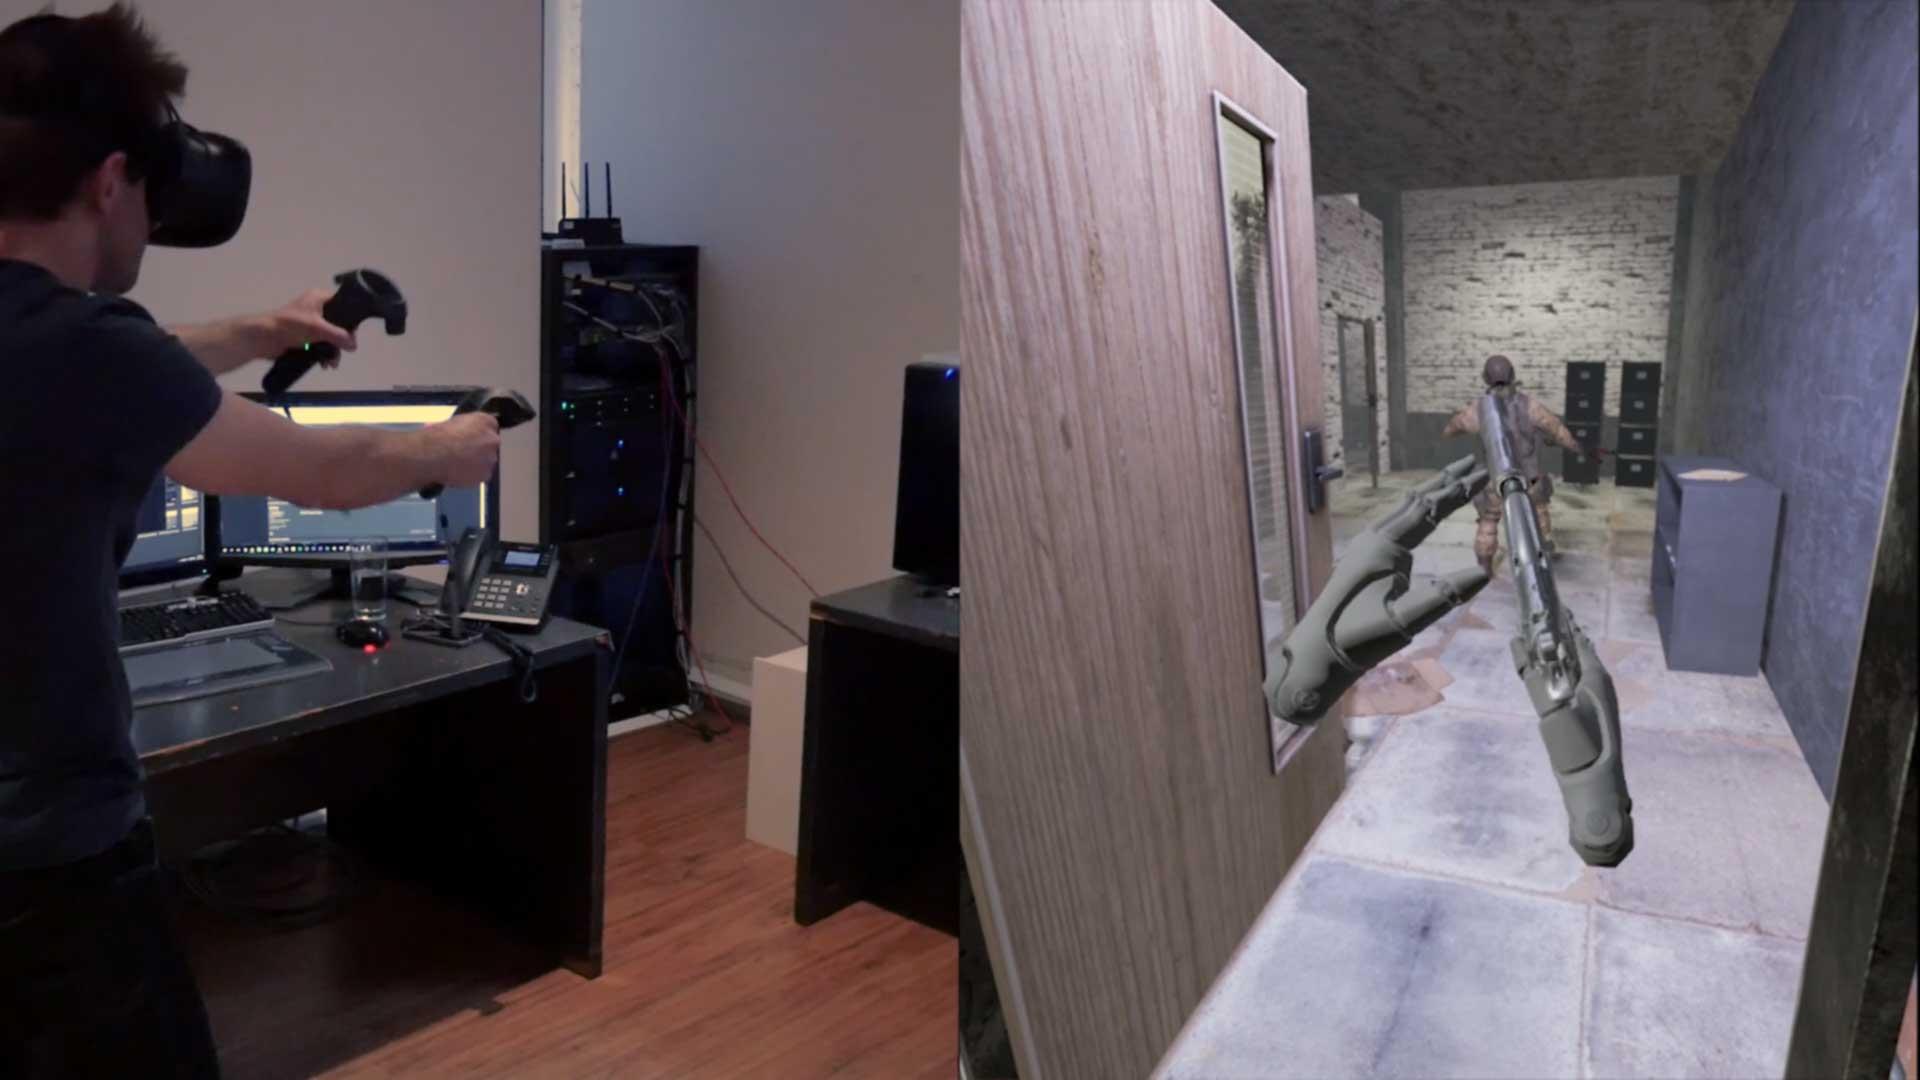 Espire 1 VR Stealth Game footage